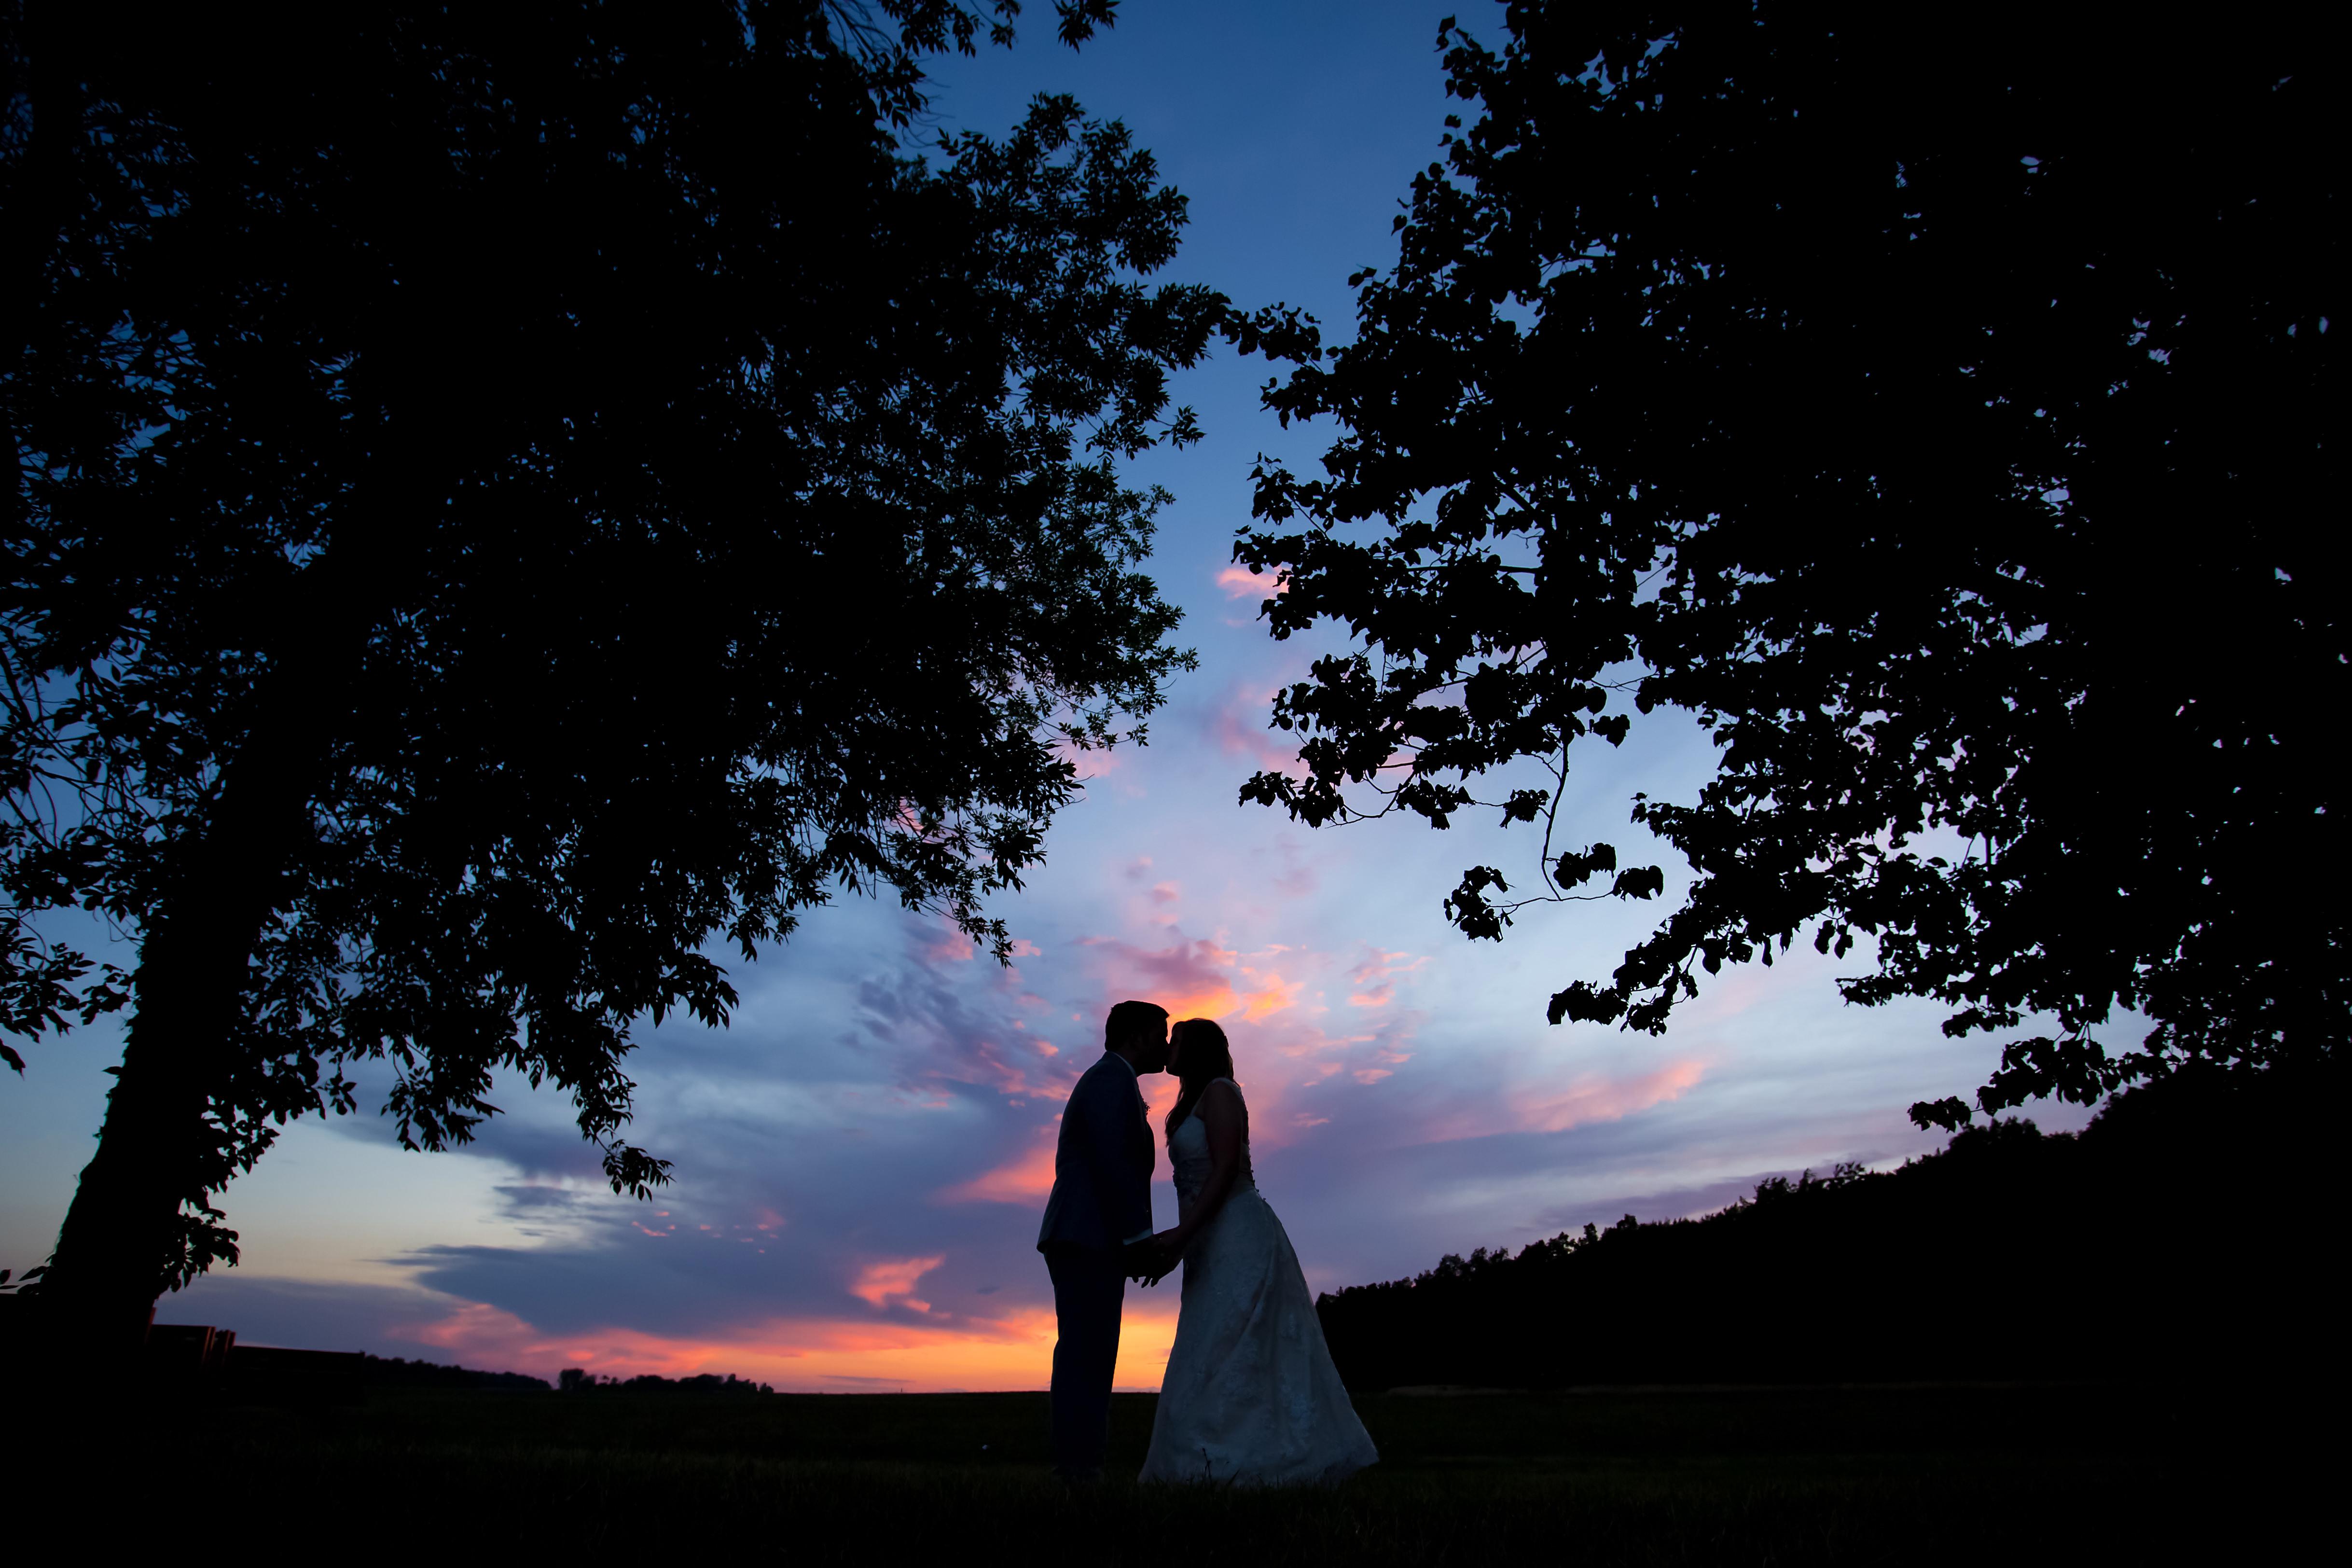 Vizcarra Vineyards Becker Farms Wedding Sunset